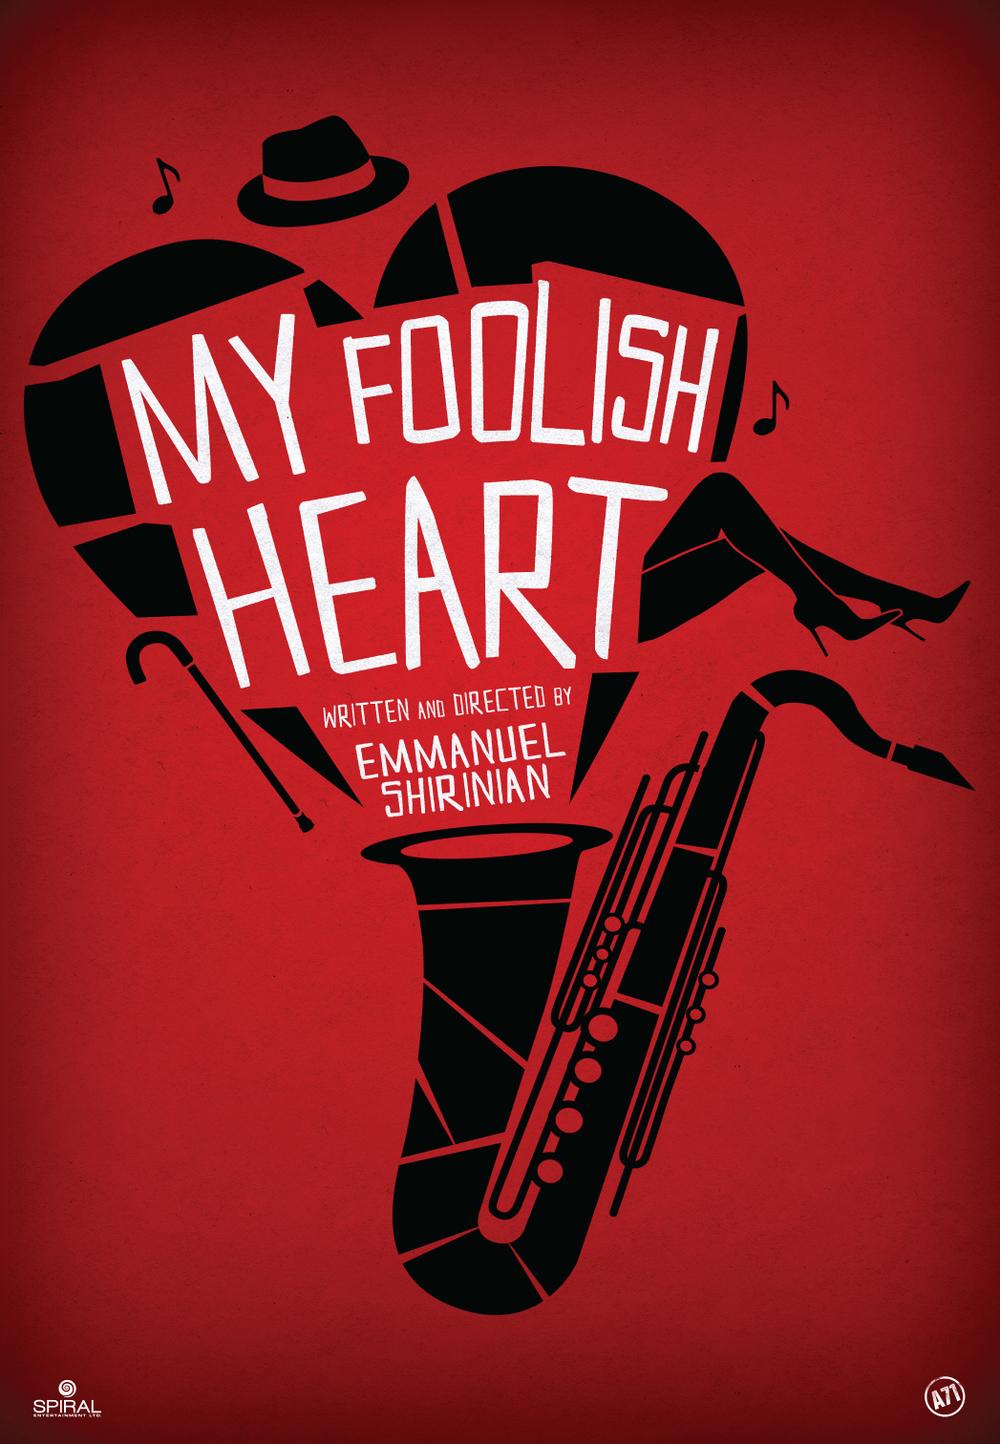 A71_MY_FOOLISH_HEART copy(1).jpg